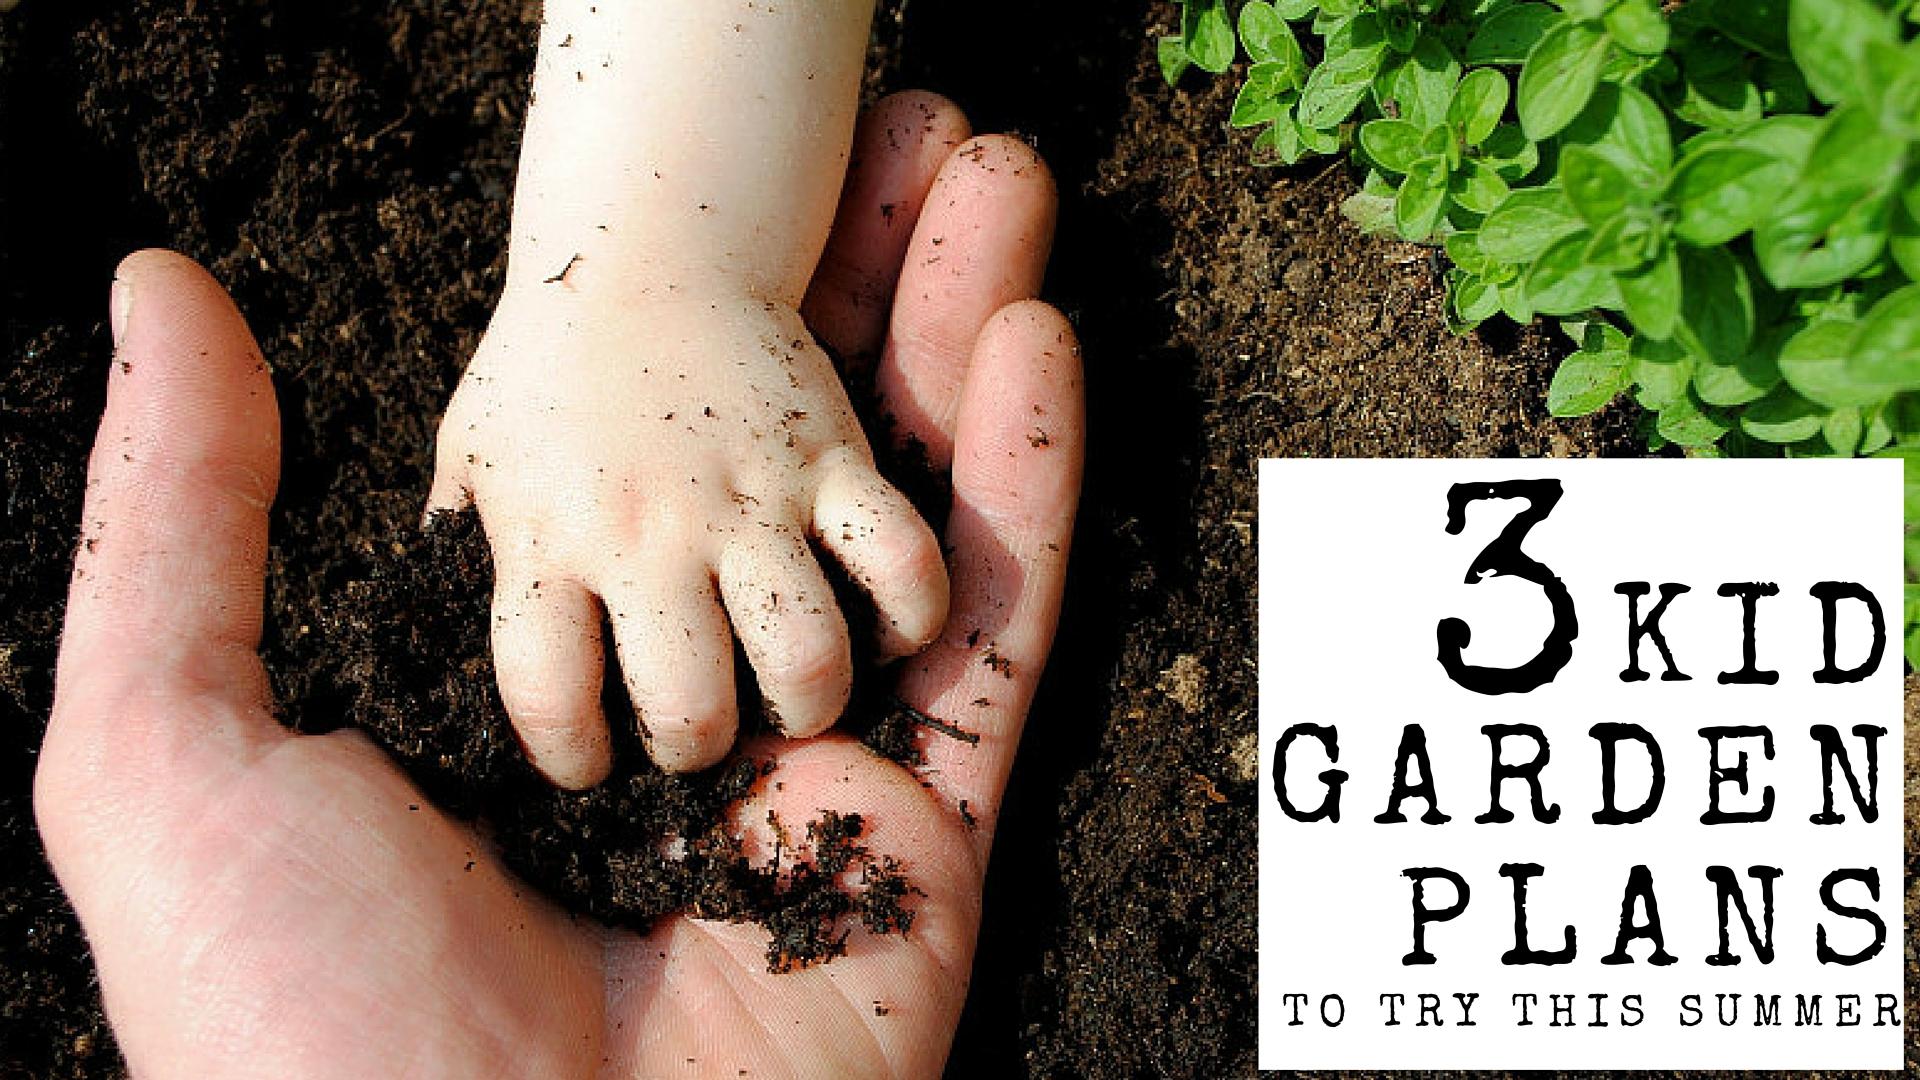 How To Grow An Easy Kids Garden...